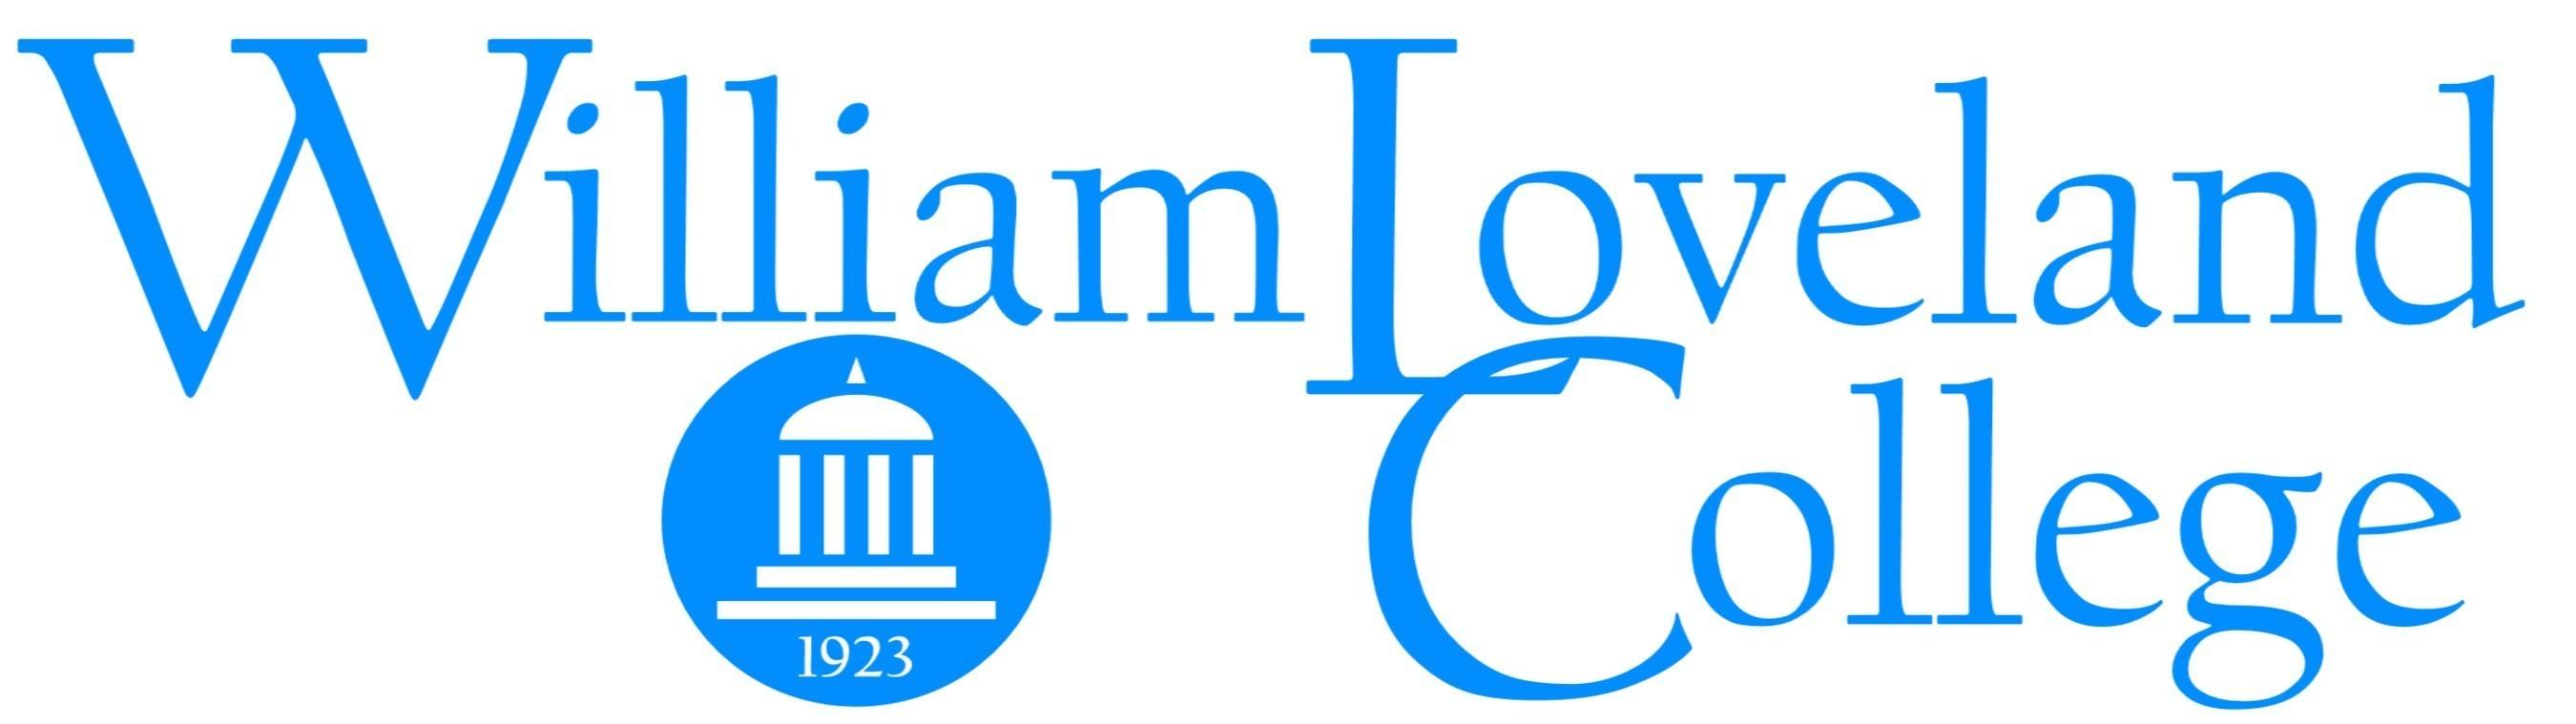 William Loveland College, Loveland Colorado (PRNewsFoto/William Loveland College)